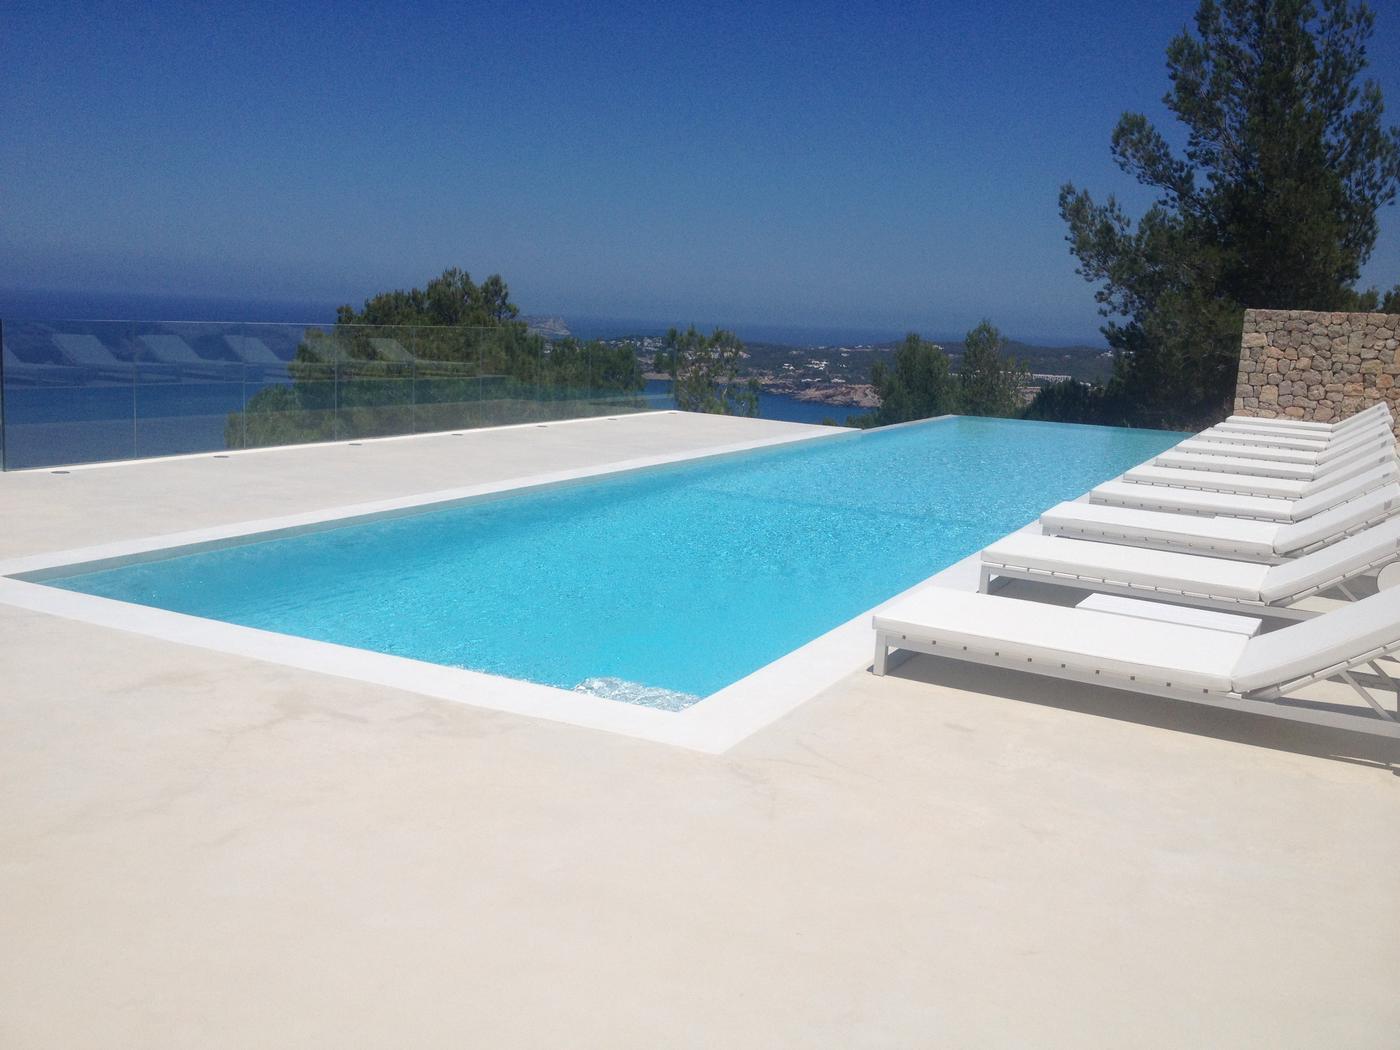 plage piscine beton